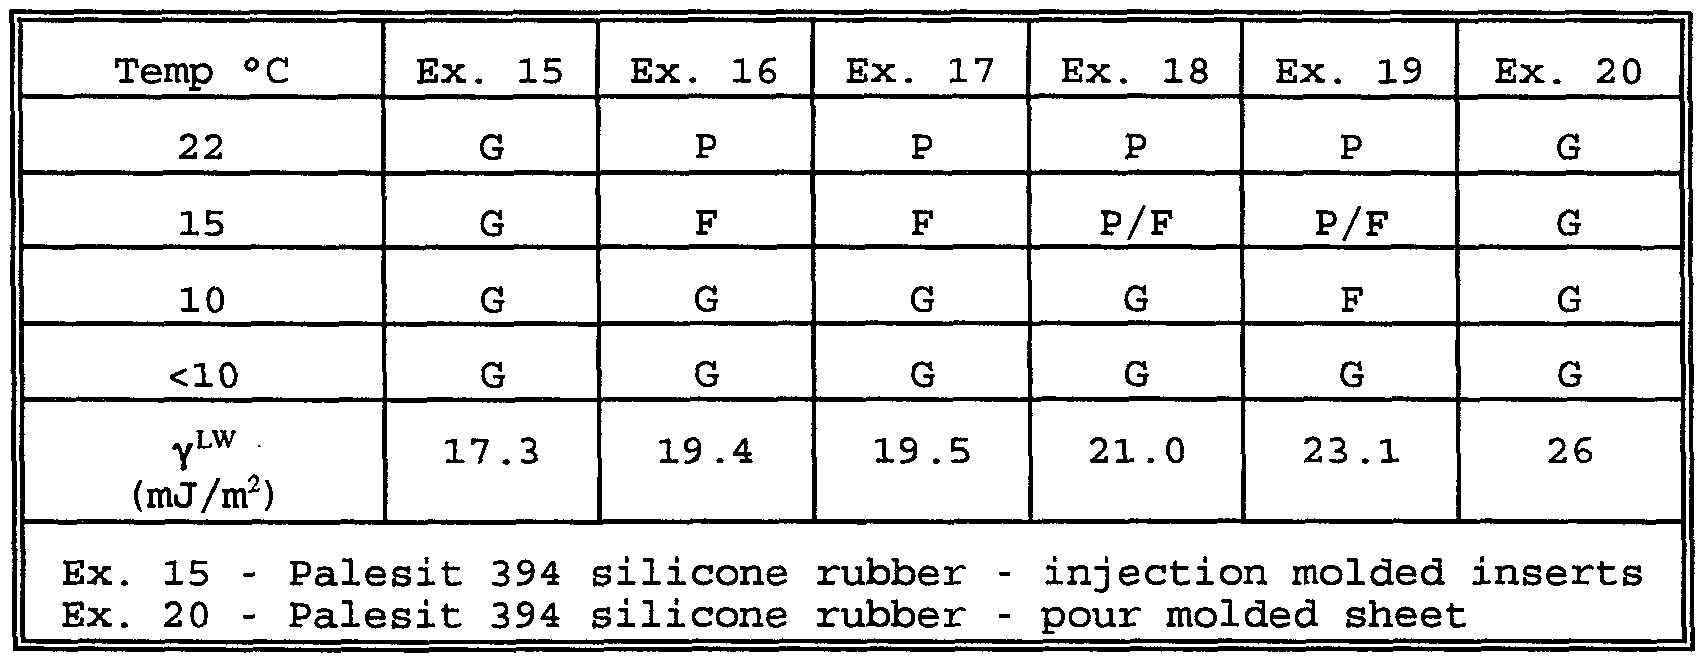 WO1999034685A1 - Improved molding process - Google Patents